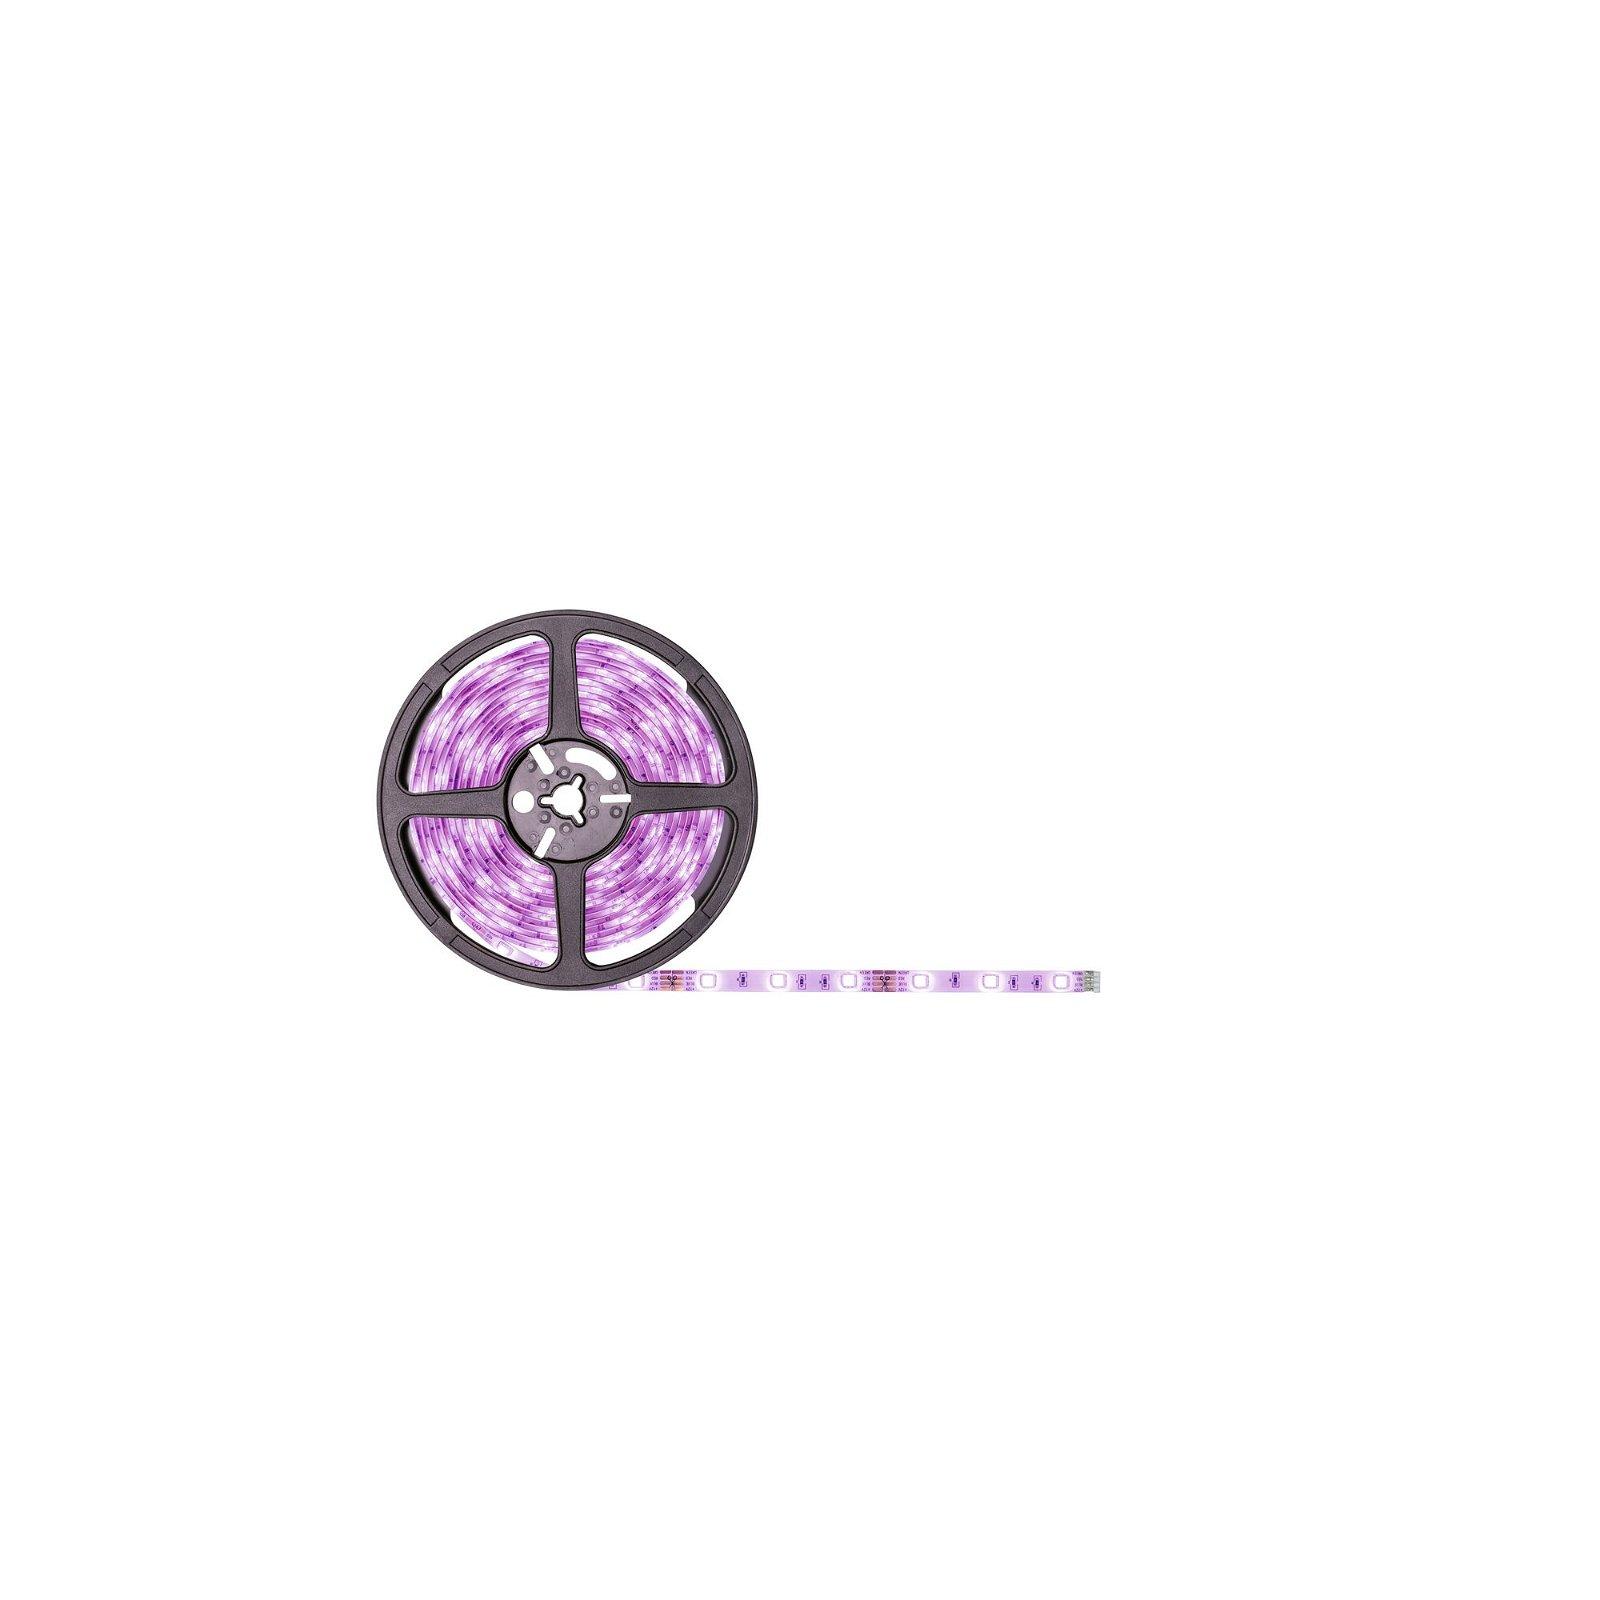 SimpLED LED Strip RGB 5m gecoat 20W 101lm/m RGB 24VA